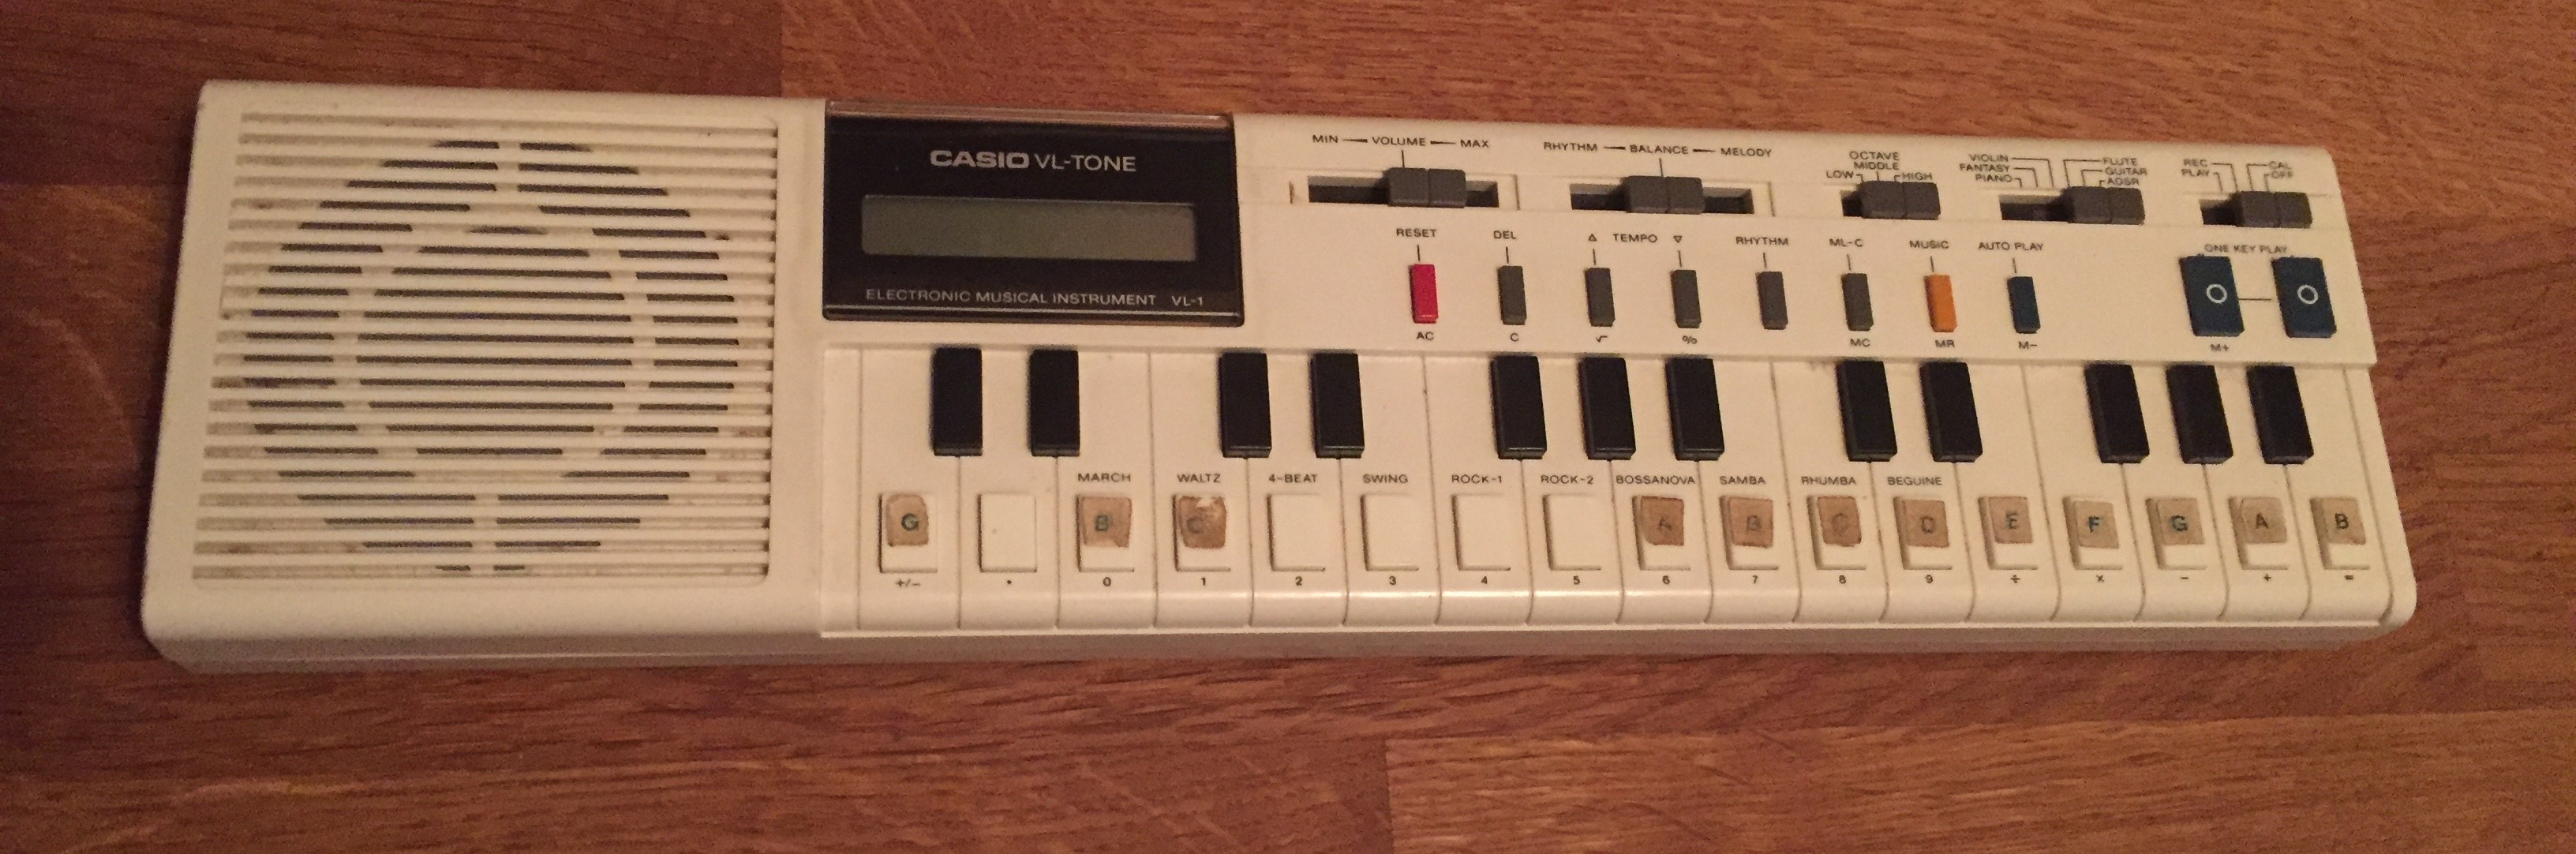 My old VL-Tone